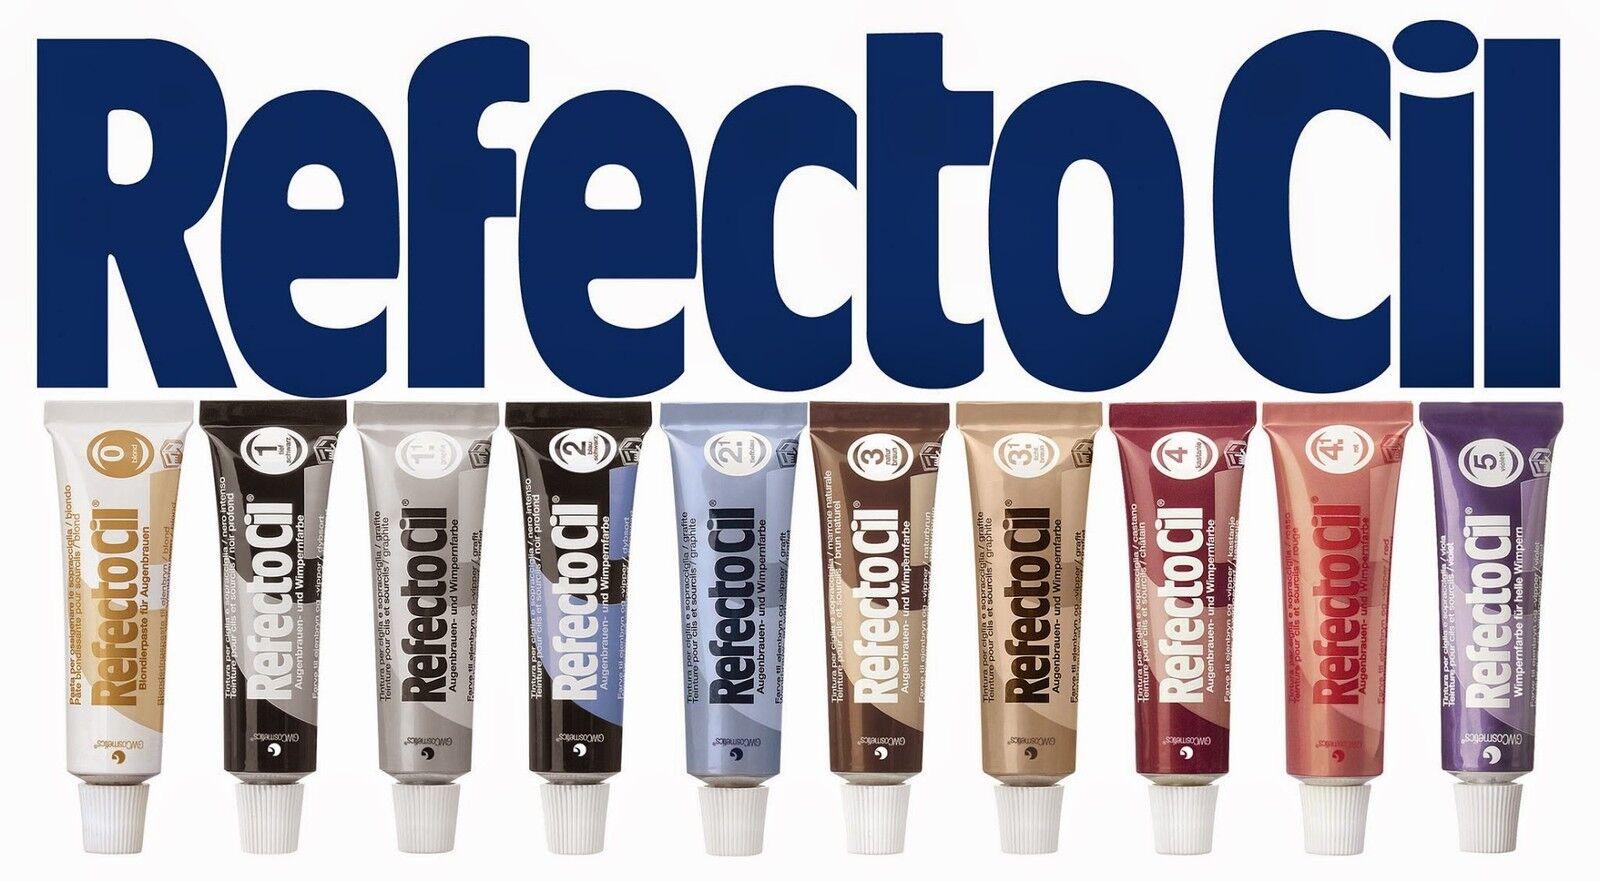 bcdbc2c250a 【Item For sale: New】: RefectoCil Professional Intensive Eyelash & Eyebrow  Dye Tint Lash Kit Tinting EU